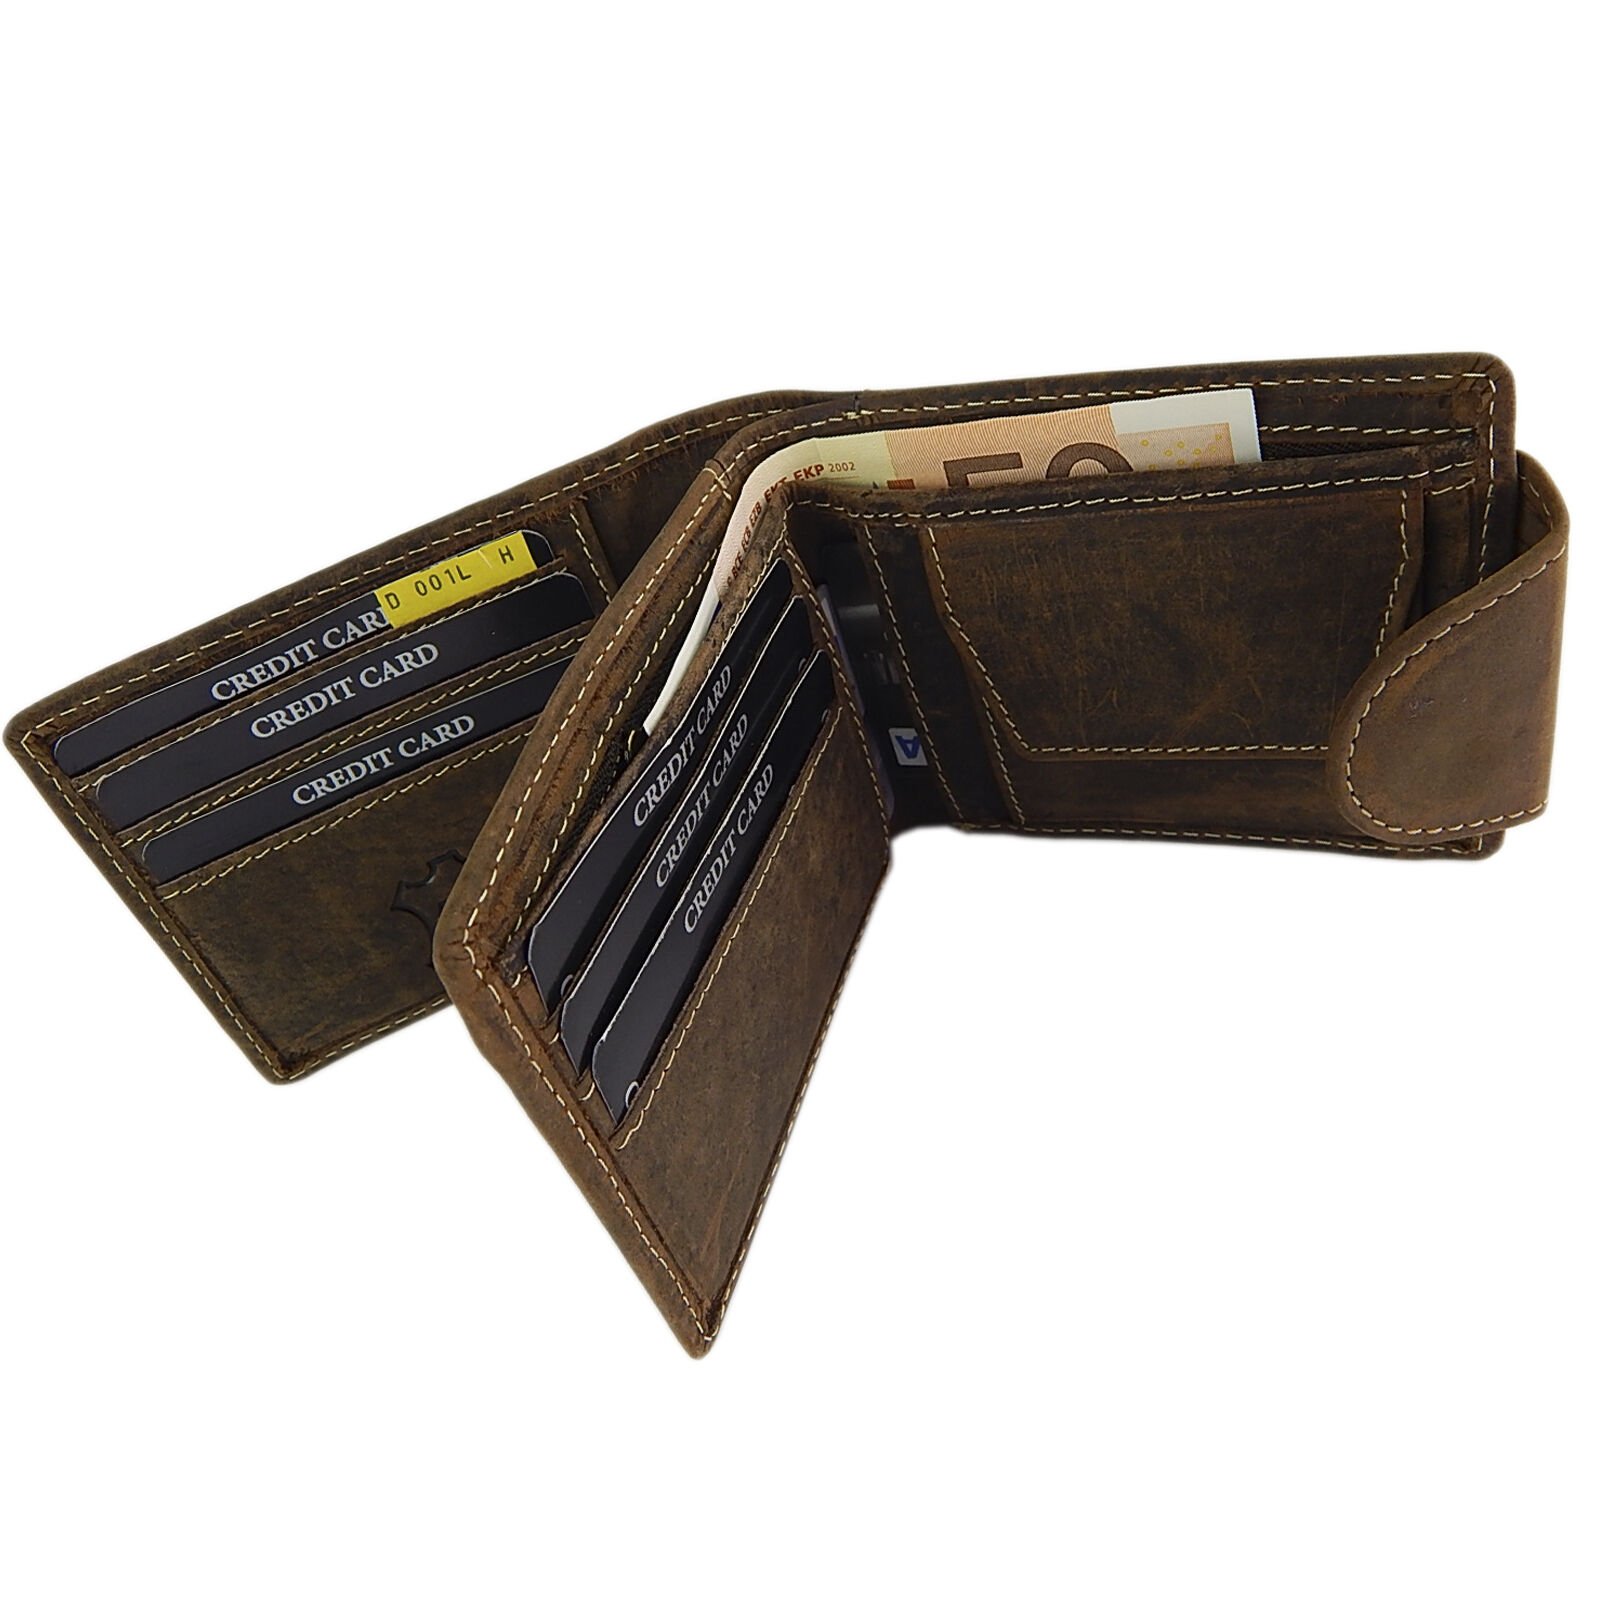 Original BRO&SIS Portemonnaie Damen Geldbörse Querformat Querformat Querformat Büffelleder Antikraun  | Sehr gute Farbe  b558a3